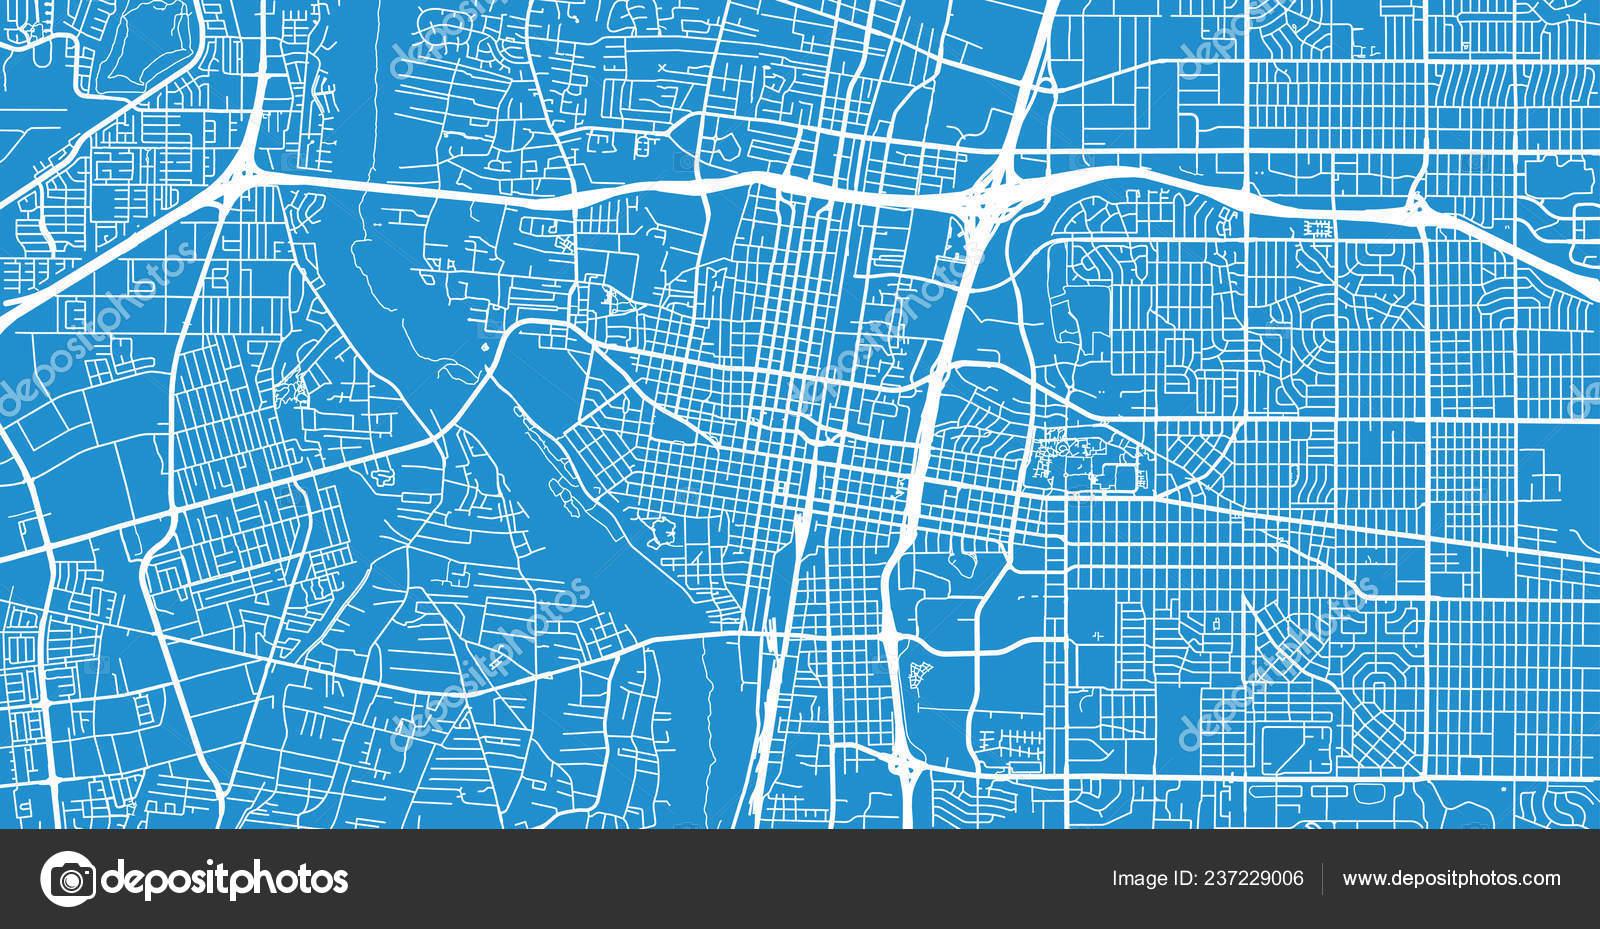 Urban Vector City Map Albuquerque New Mexico United States America ...